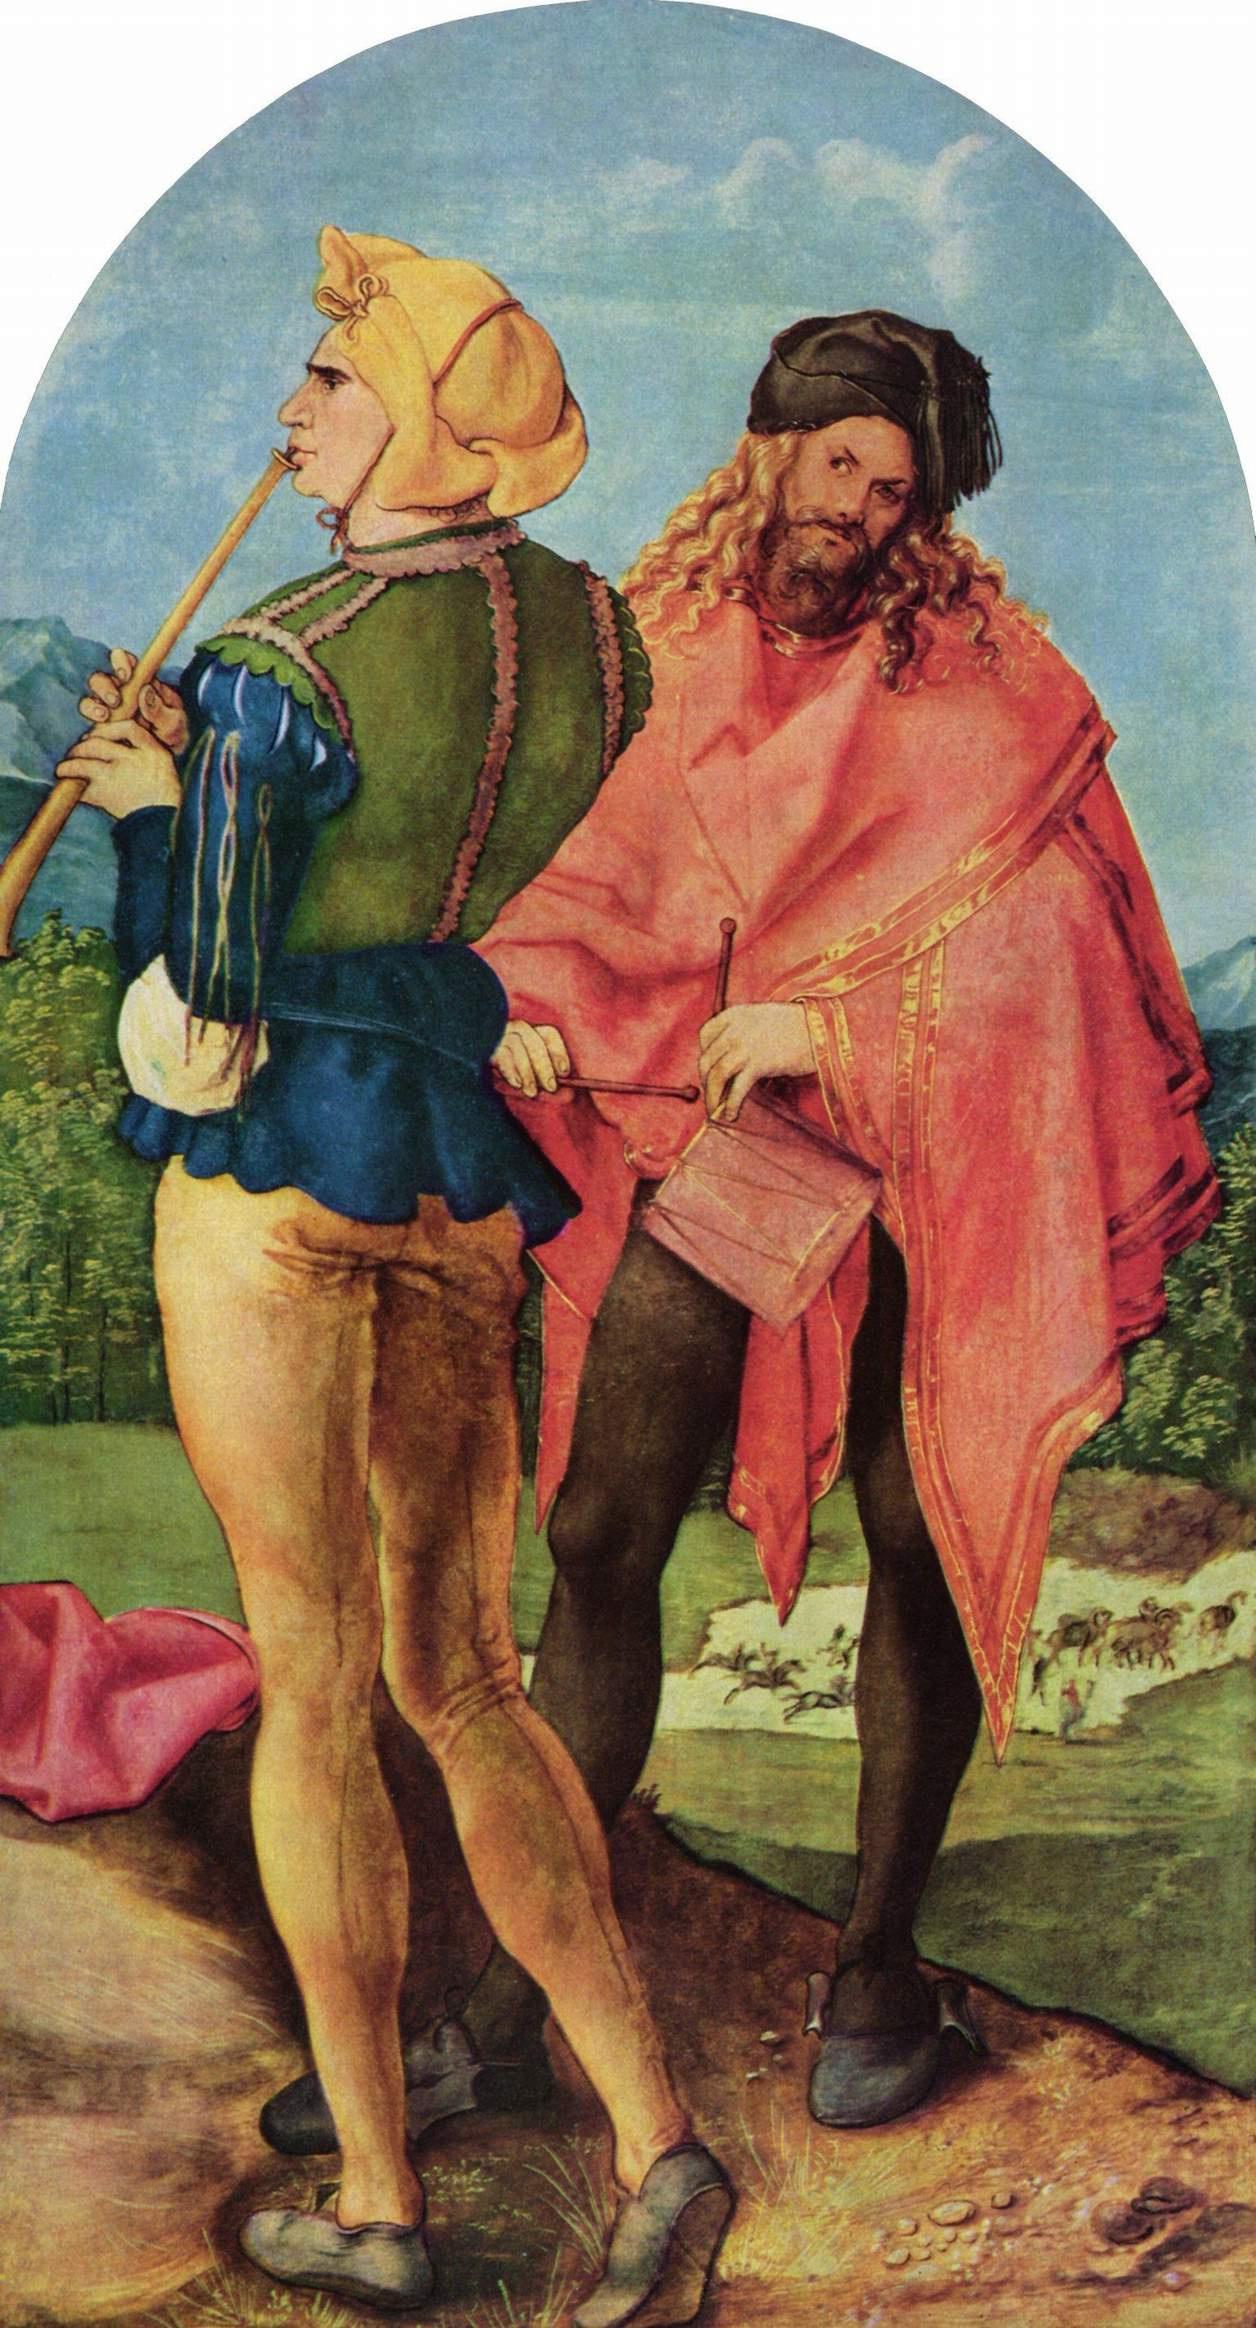 Albrecht Dürer. The Job Of The Altar (The Altar Abacha). Right panel: the Drummer and flutist